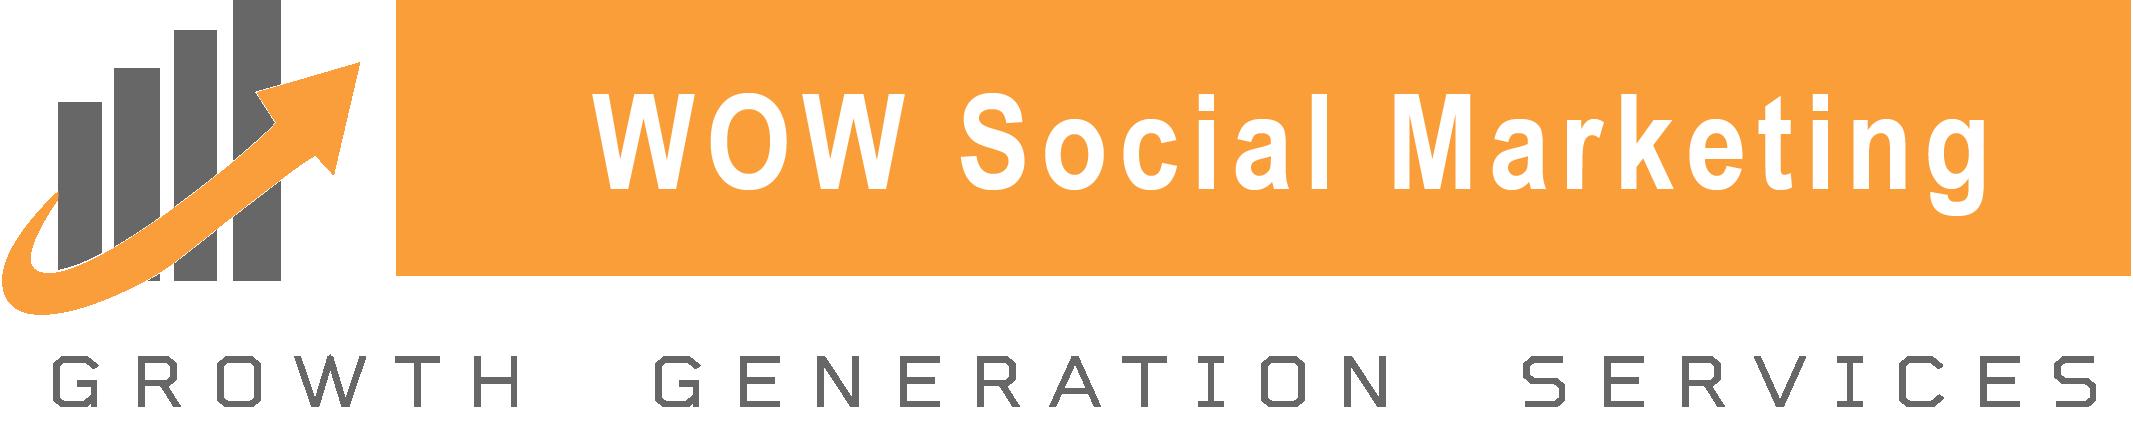 Wow Social Media Agency